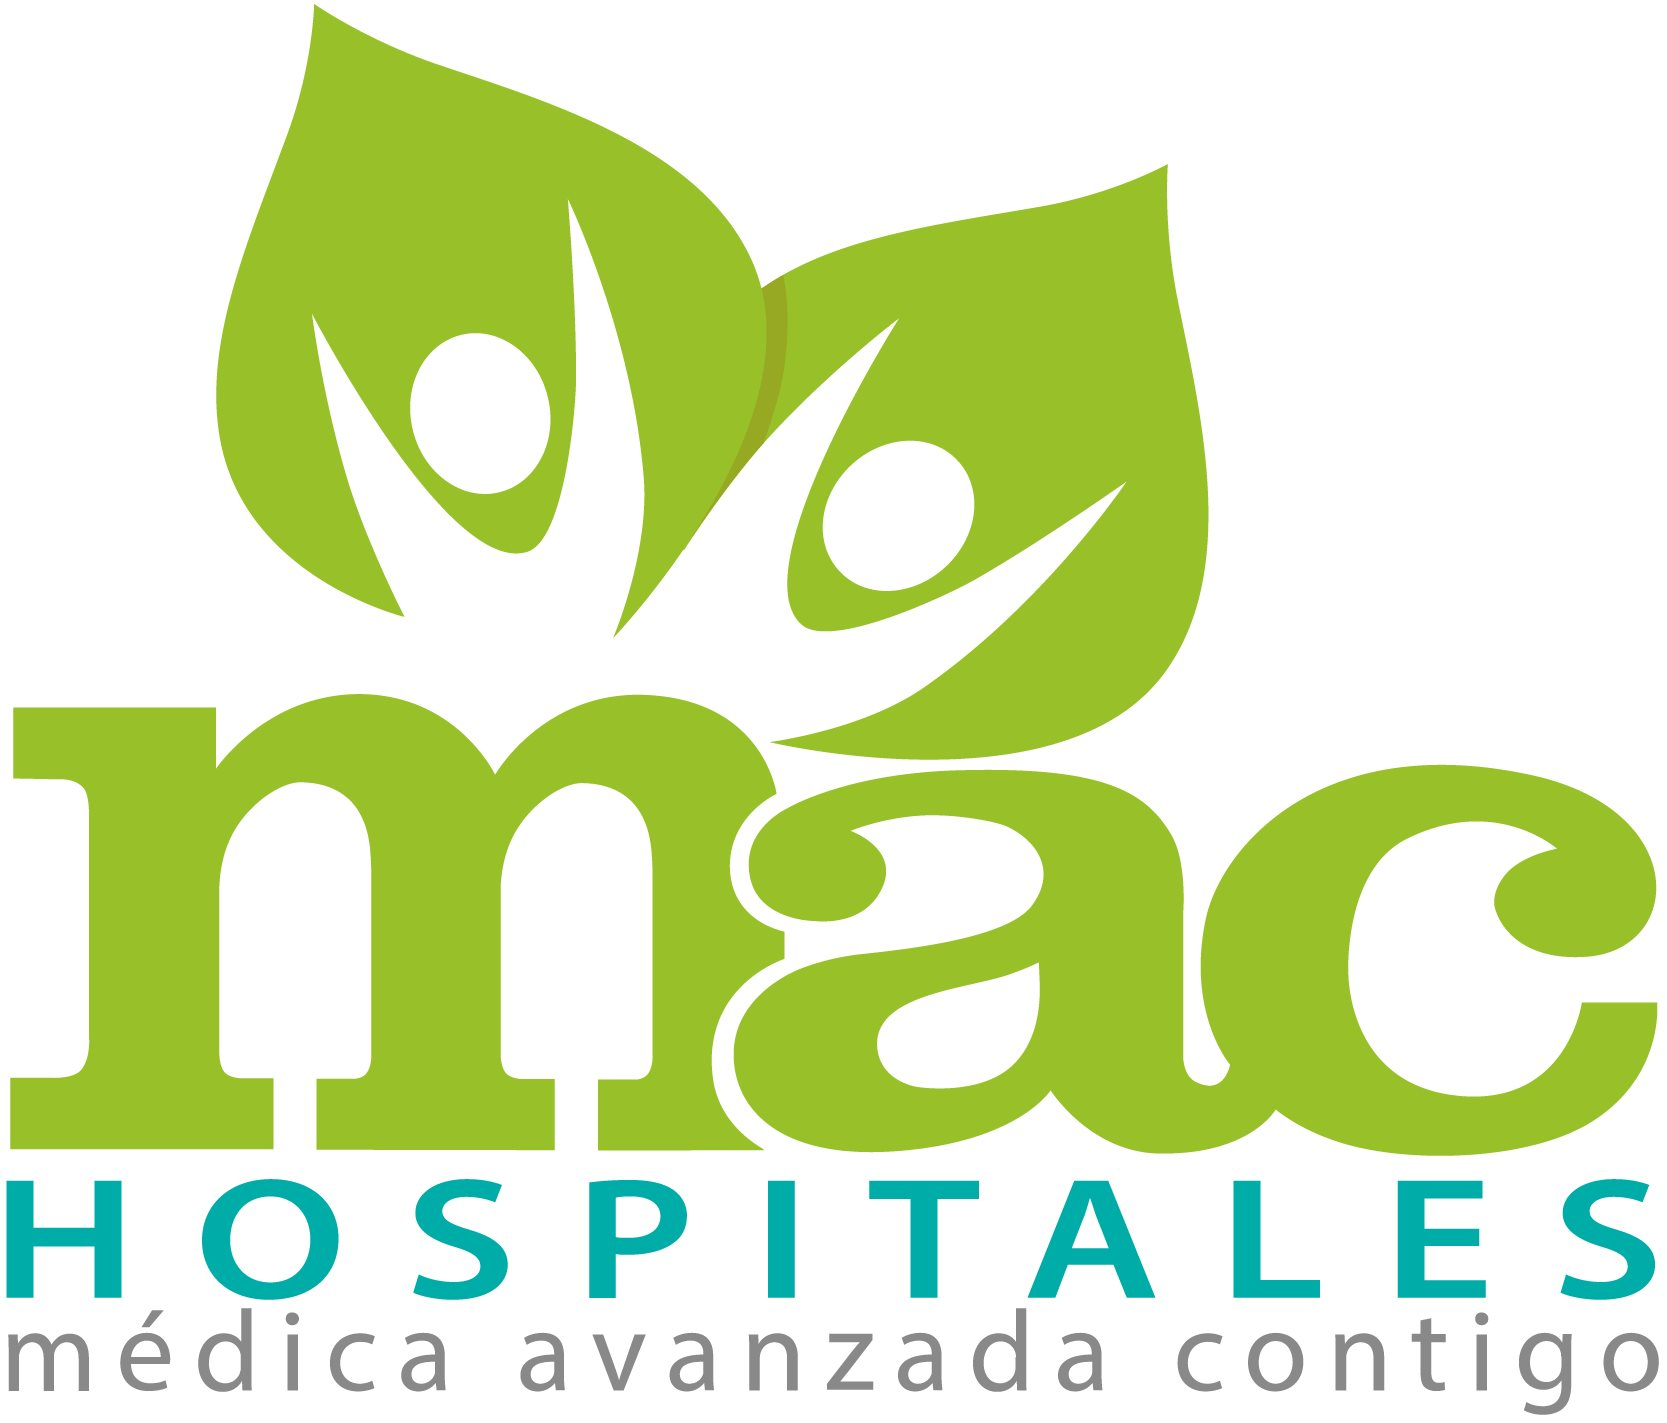 CENTRO HOSPITALARIO MAC